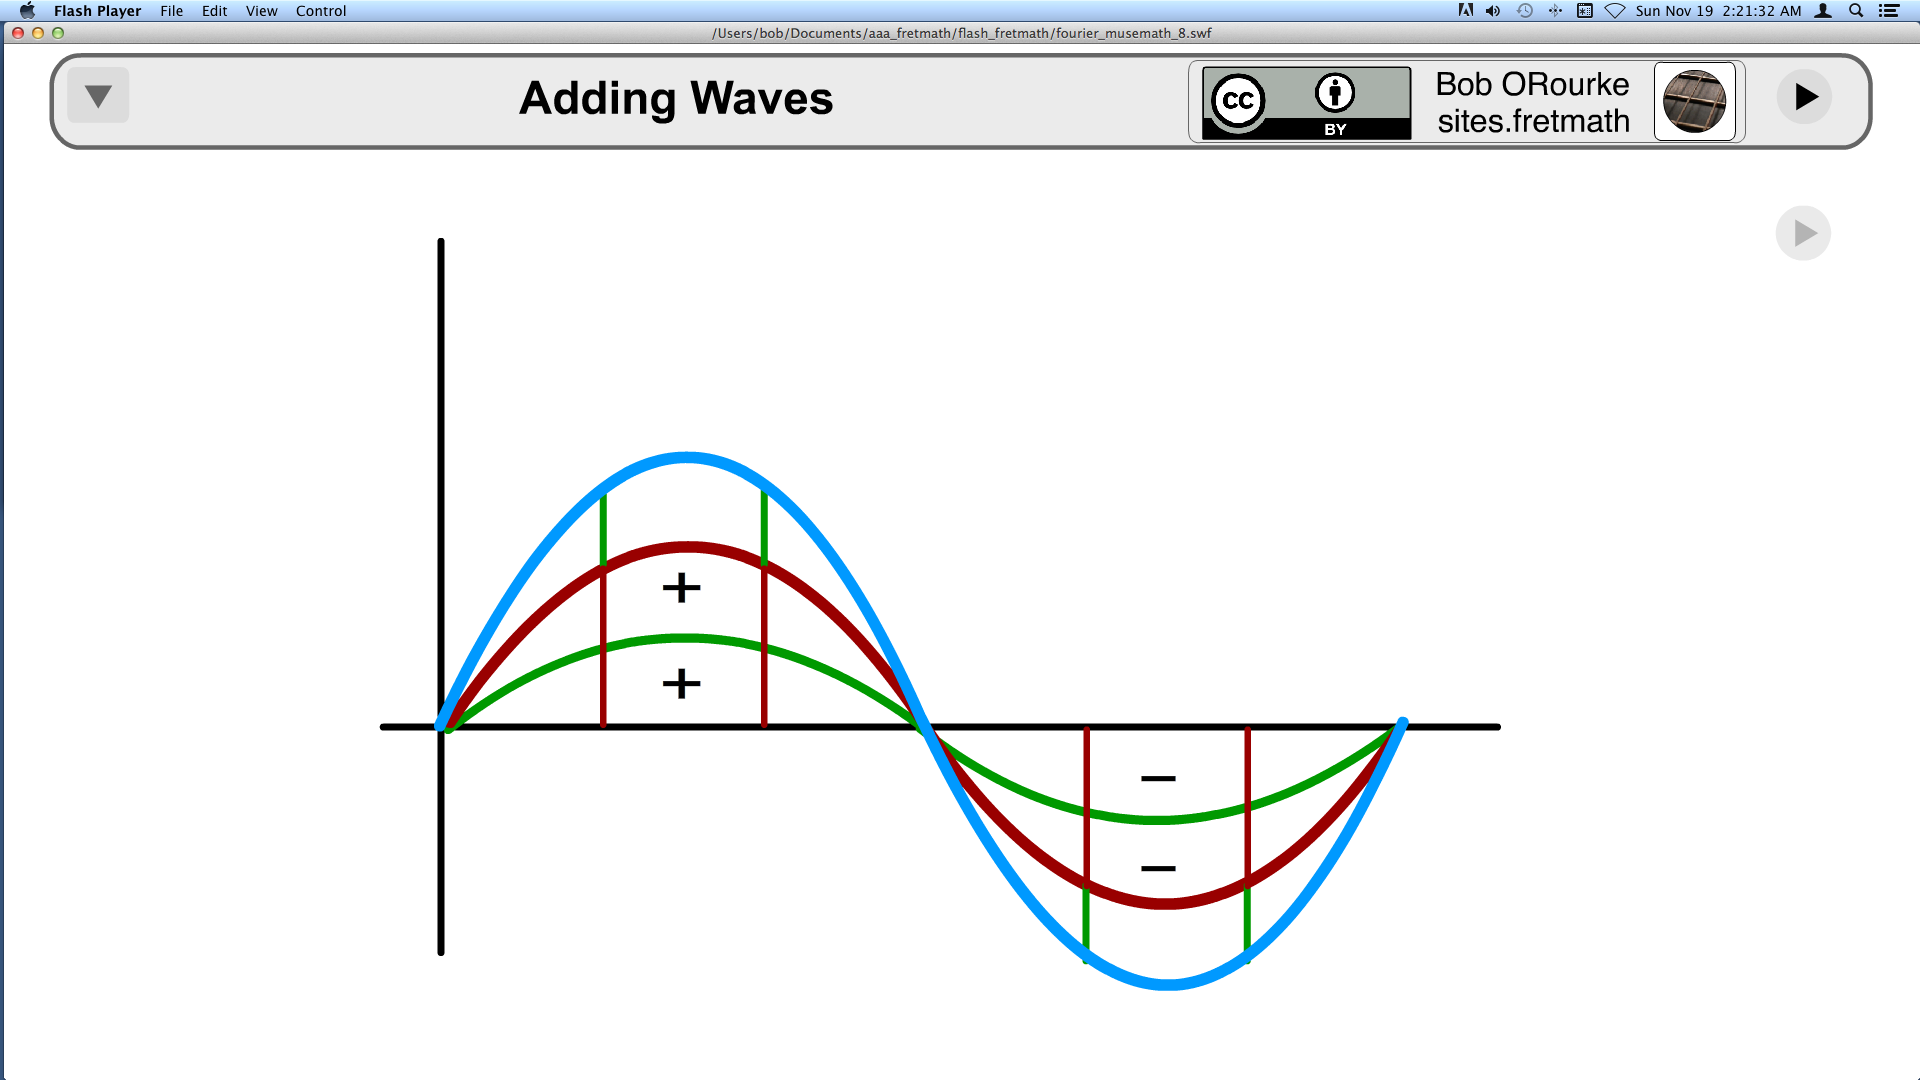 Adding Waves 2